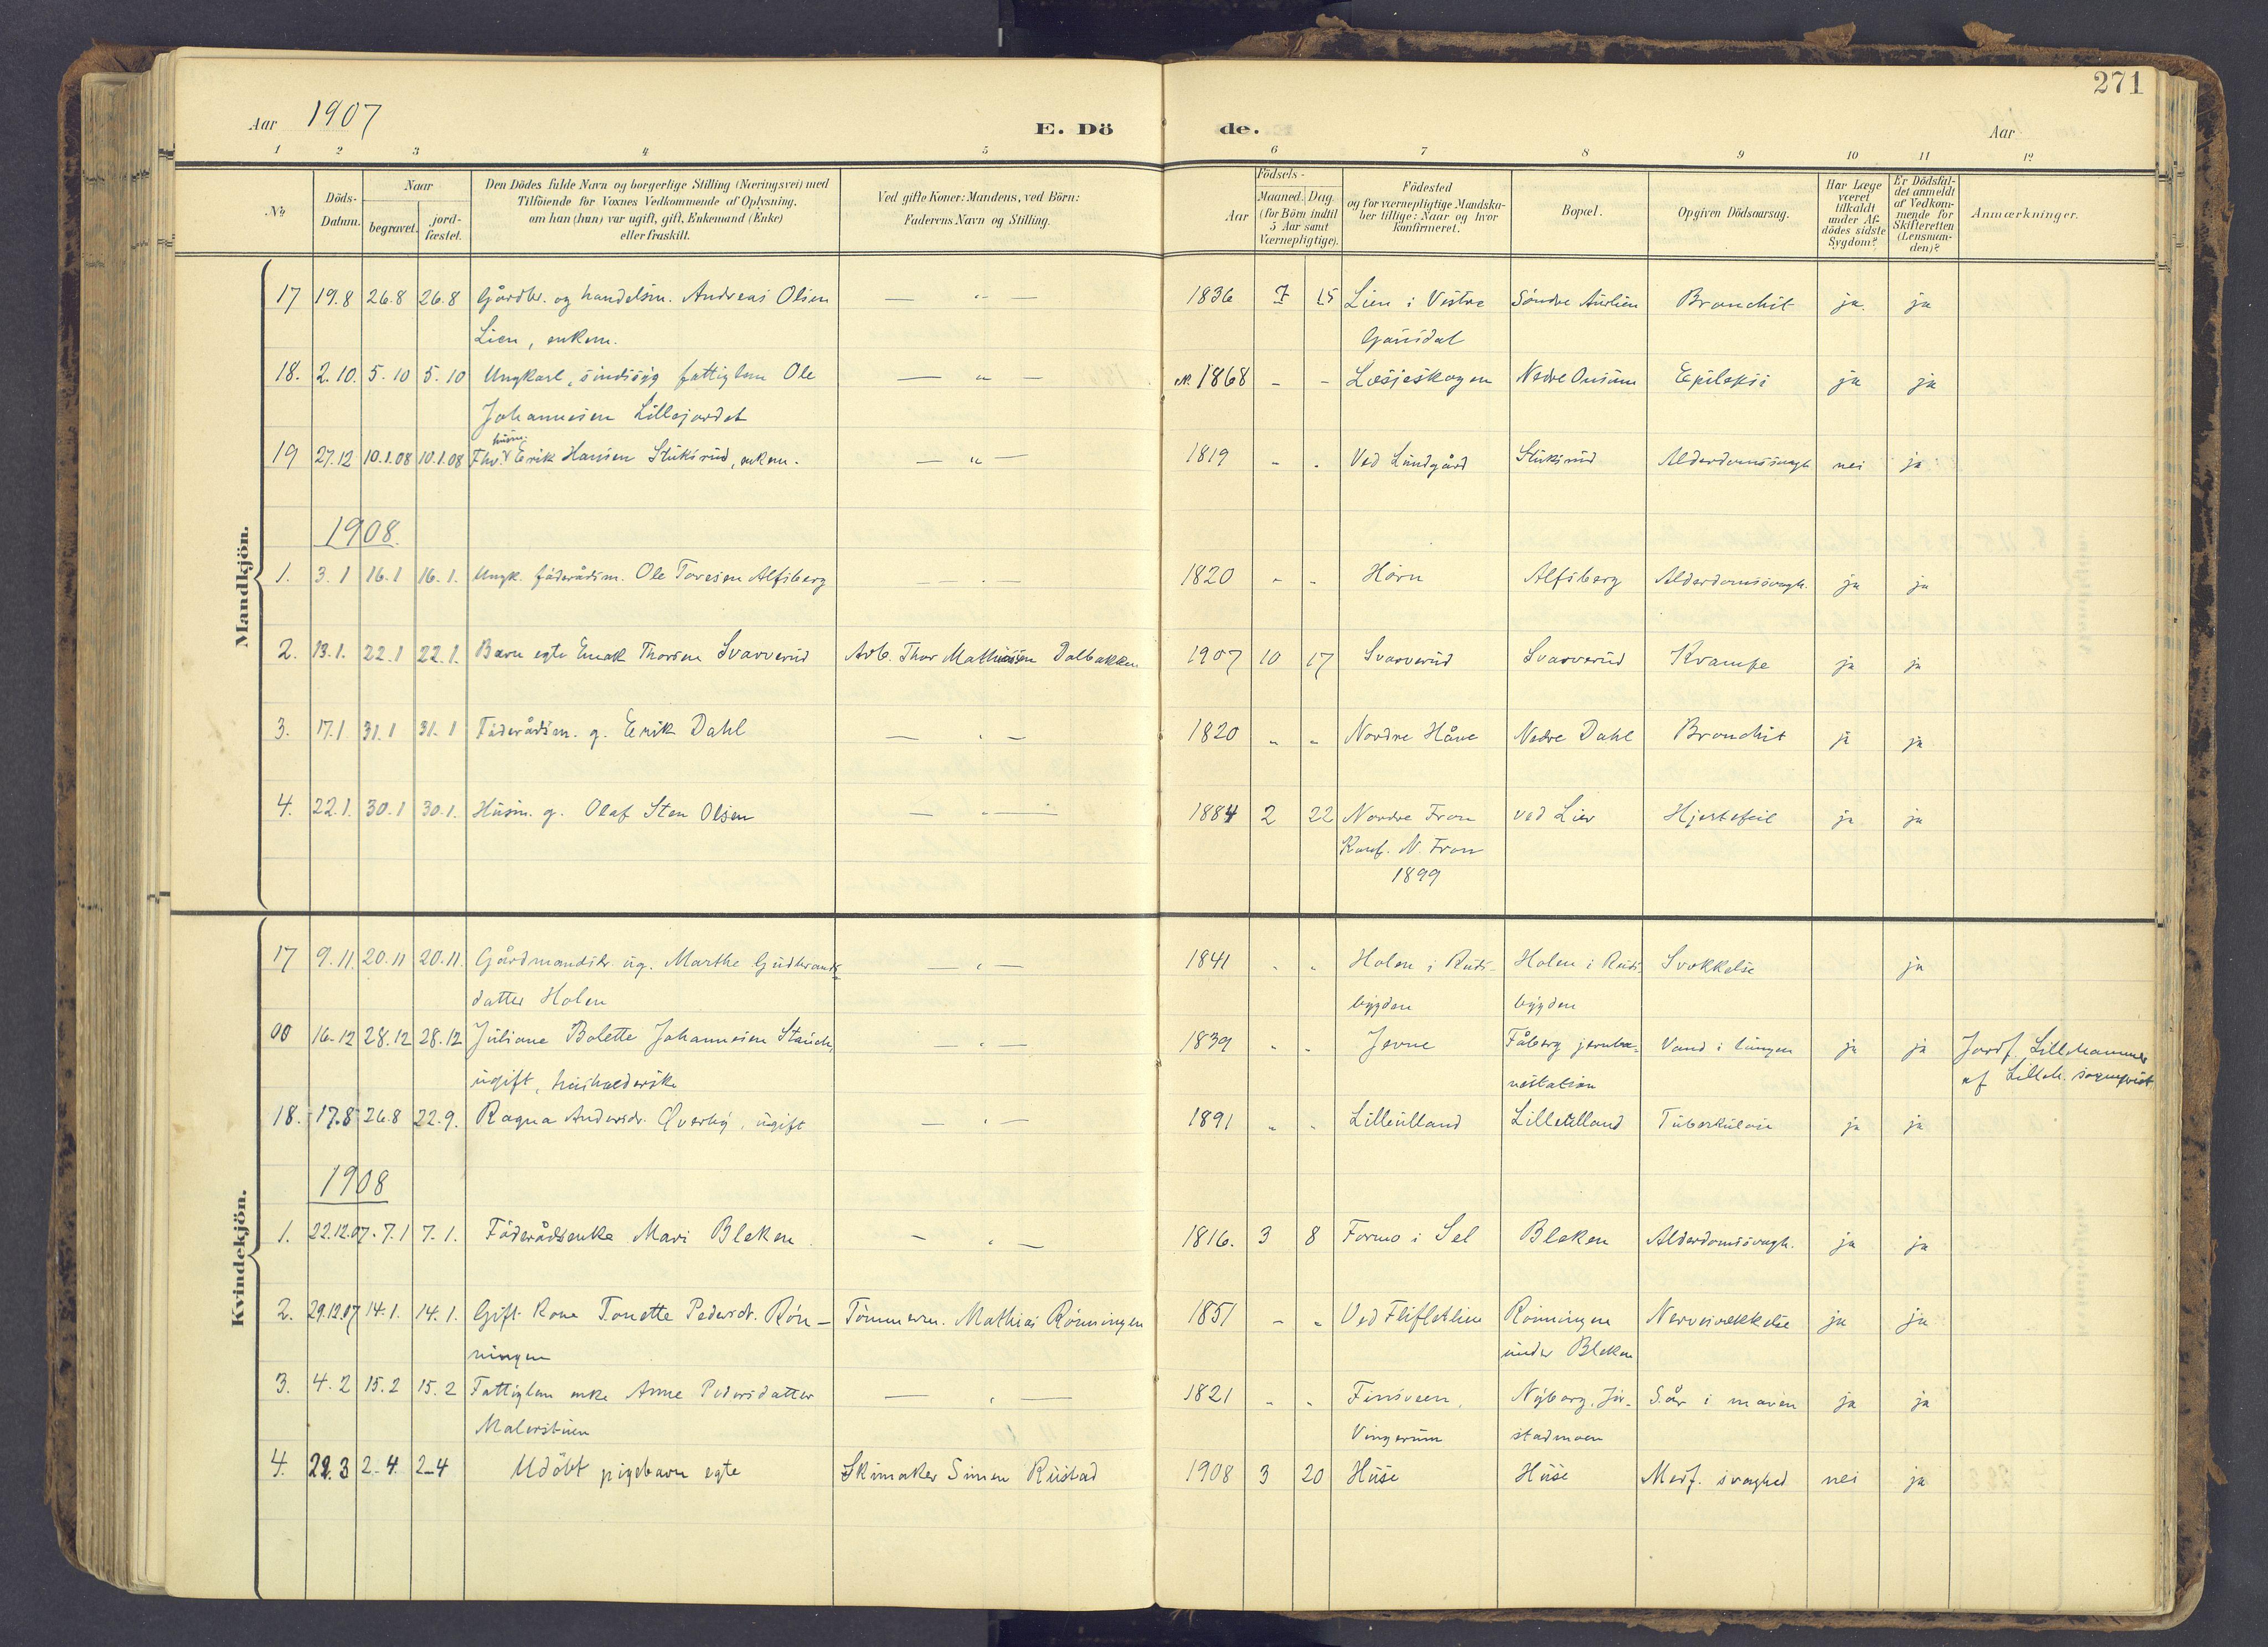 SAH, Fåberg prestekontor, Ministerialbok nr. 12, 1899-1915, s. 271